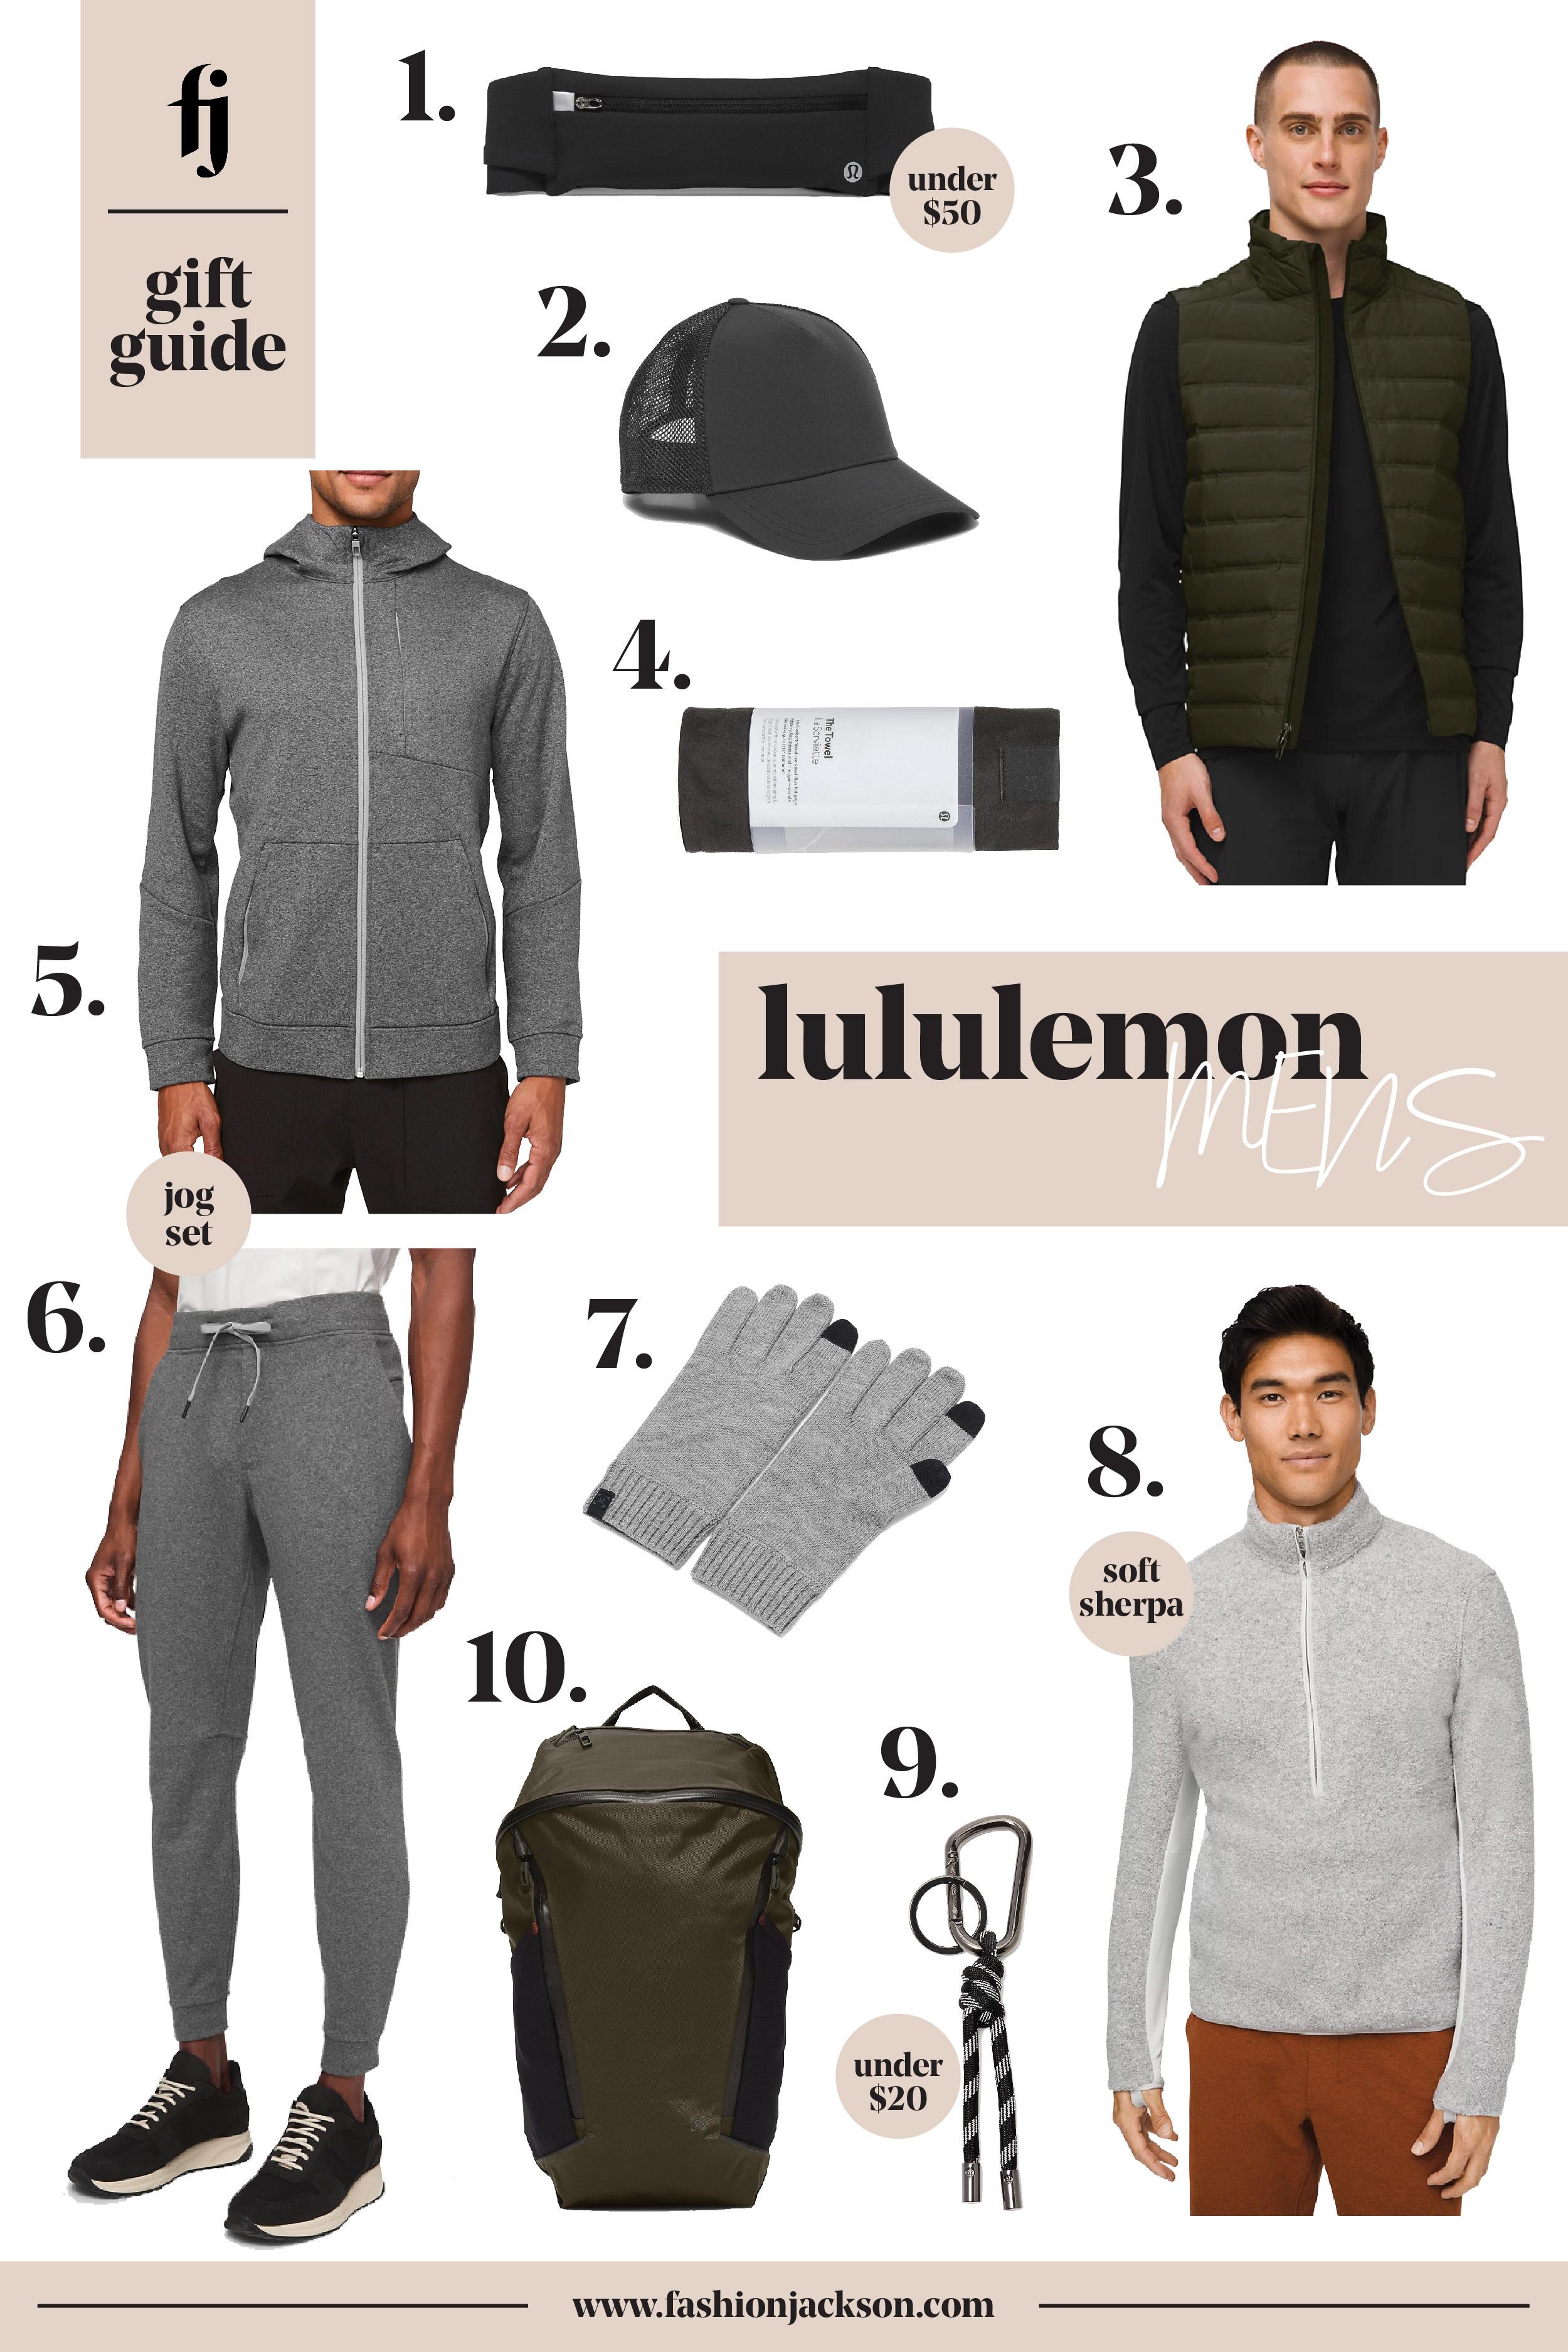 Fashion Jackson lululemon Mens Gift Guide